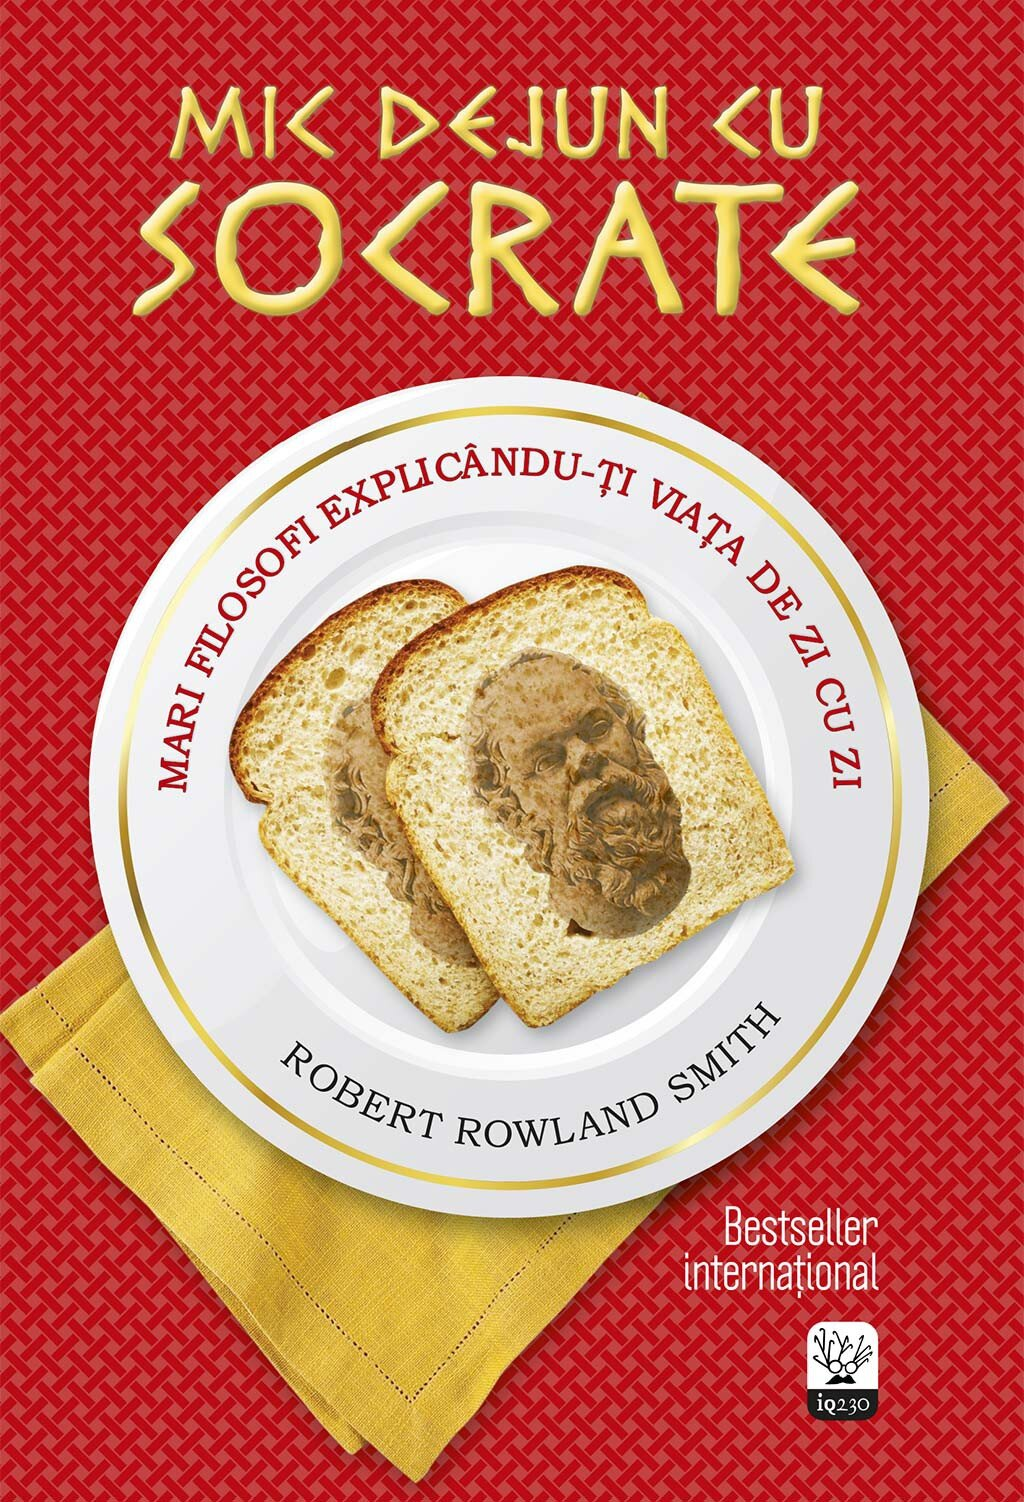 Mic dejun cu Socrate. Mari filosofi explicandu-ti viata de zi cu zi (eBook)